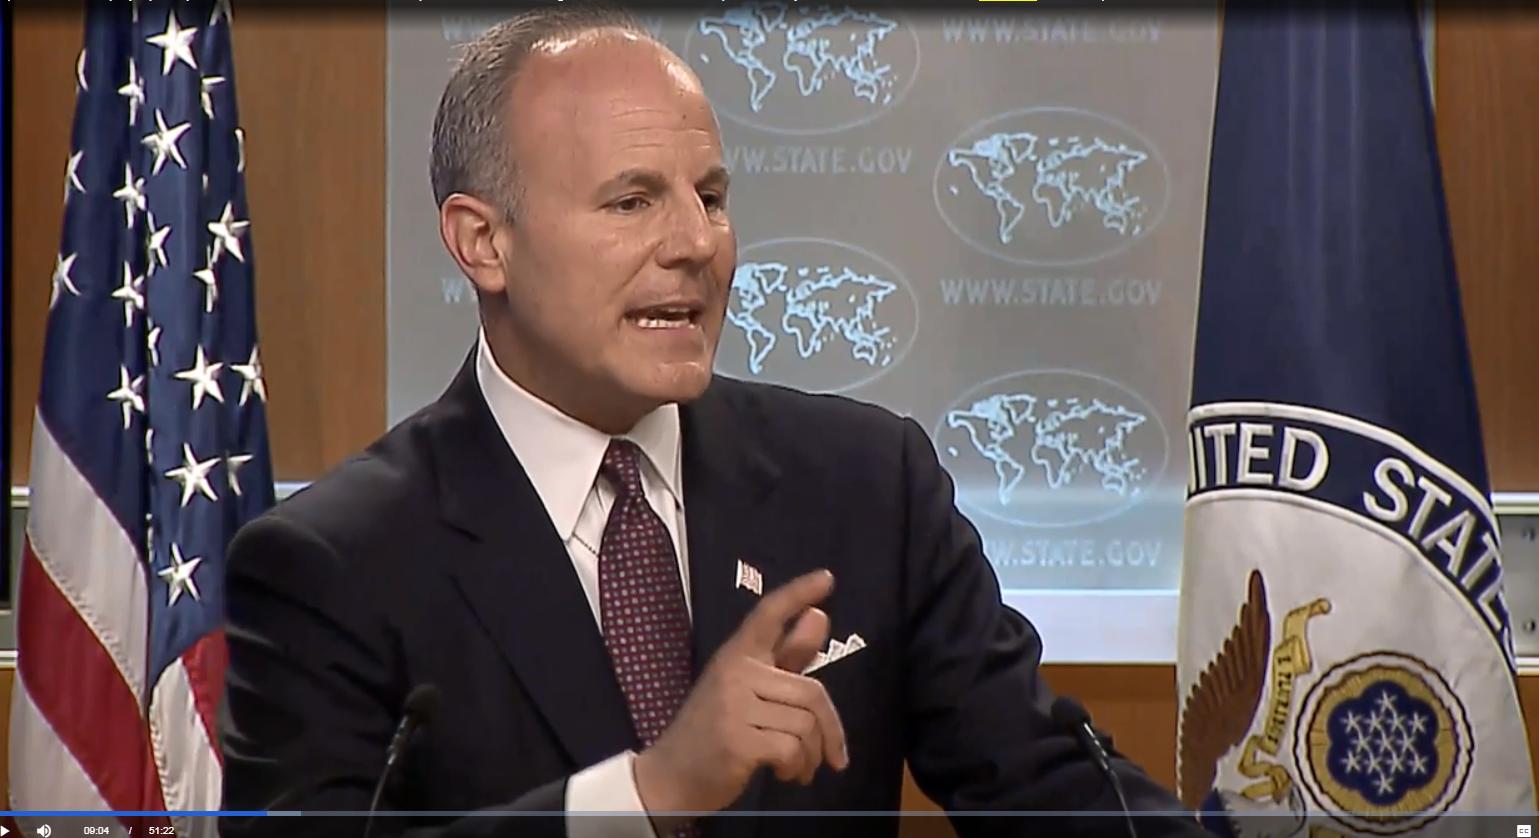 Elan Carr, United States Special Envoy to Monitor and Combat Anti-Semitism, at press briefing on April 11, 2019. Screenshot.